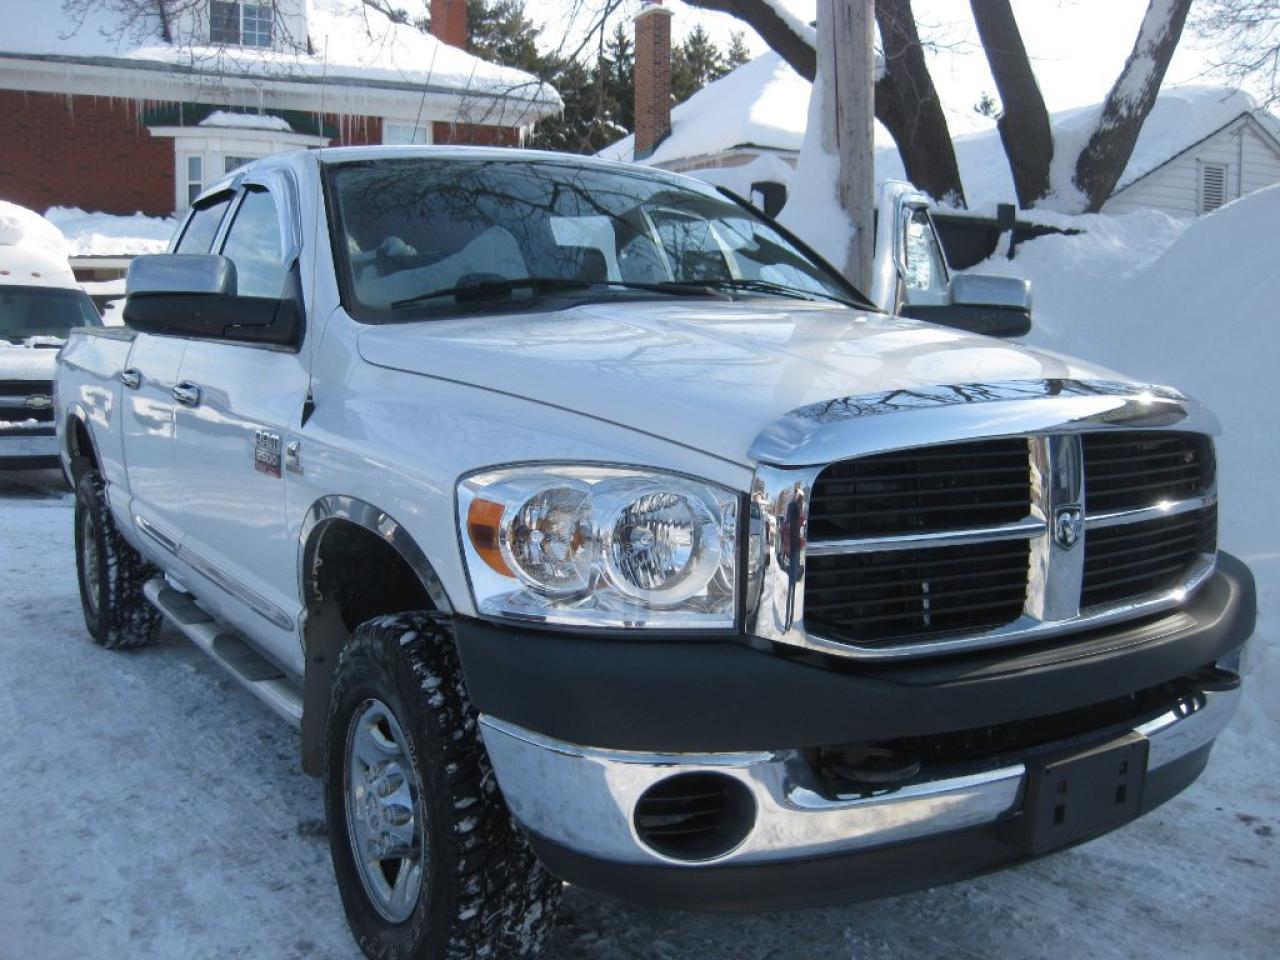 2008 Dodge Ram 2500 SLT,p/w p/l,4x4 6 cyl diesel,4 door,keyless entry,